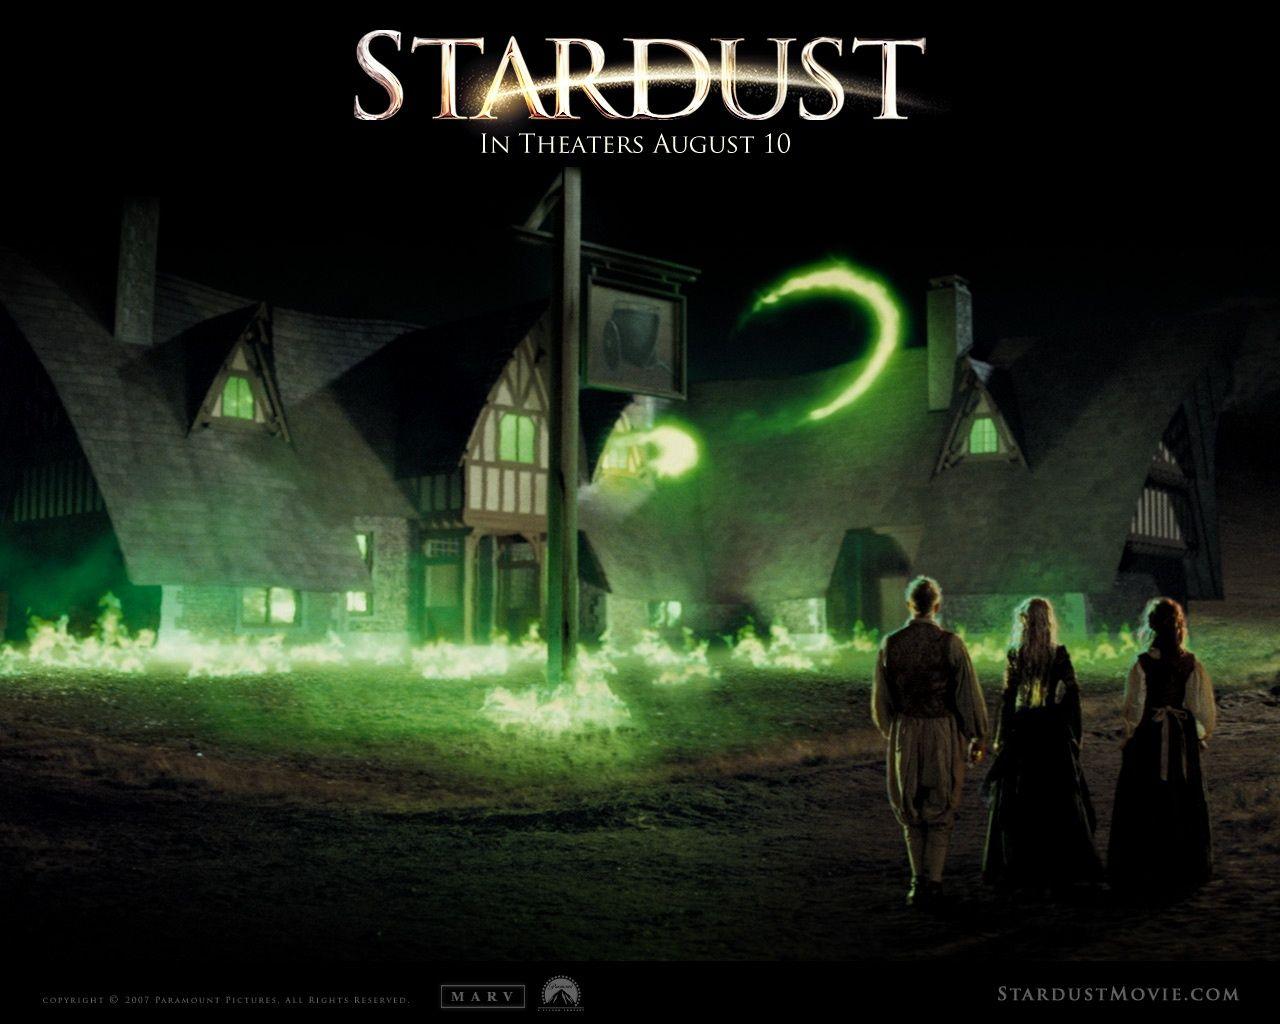 Wonderful Wallpaper Movie Stardust - 551121b6cc563ea3a69913a53f6c6070  Pic_788485.jpg